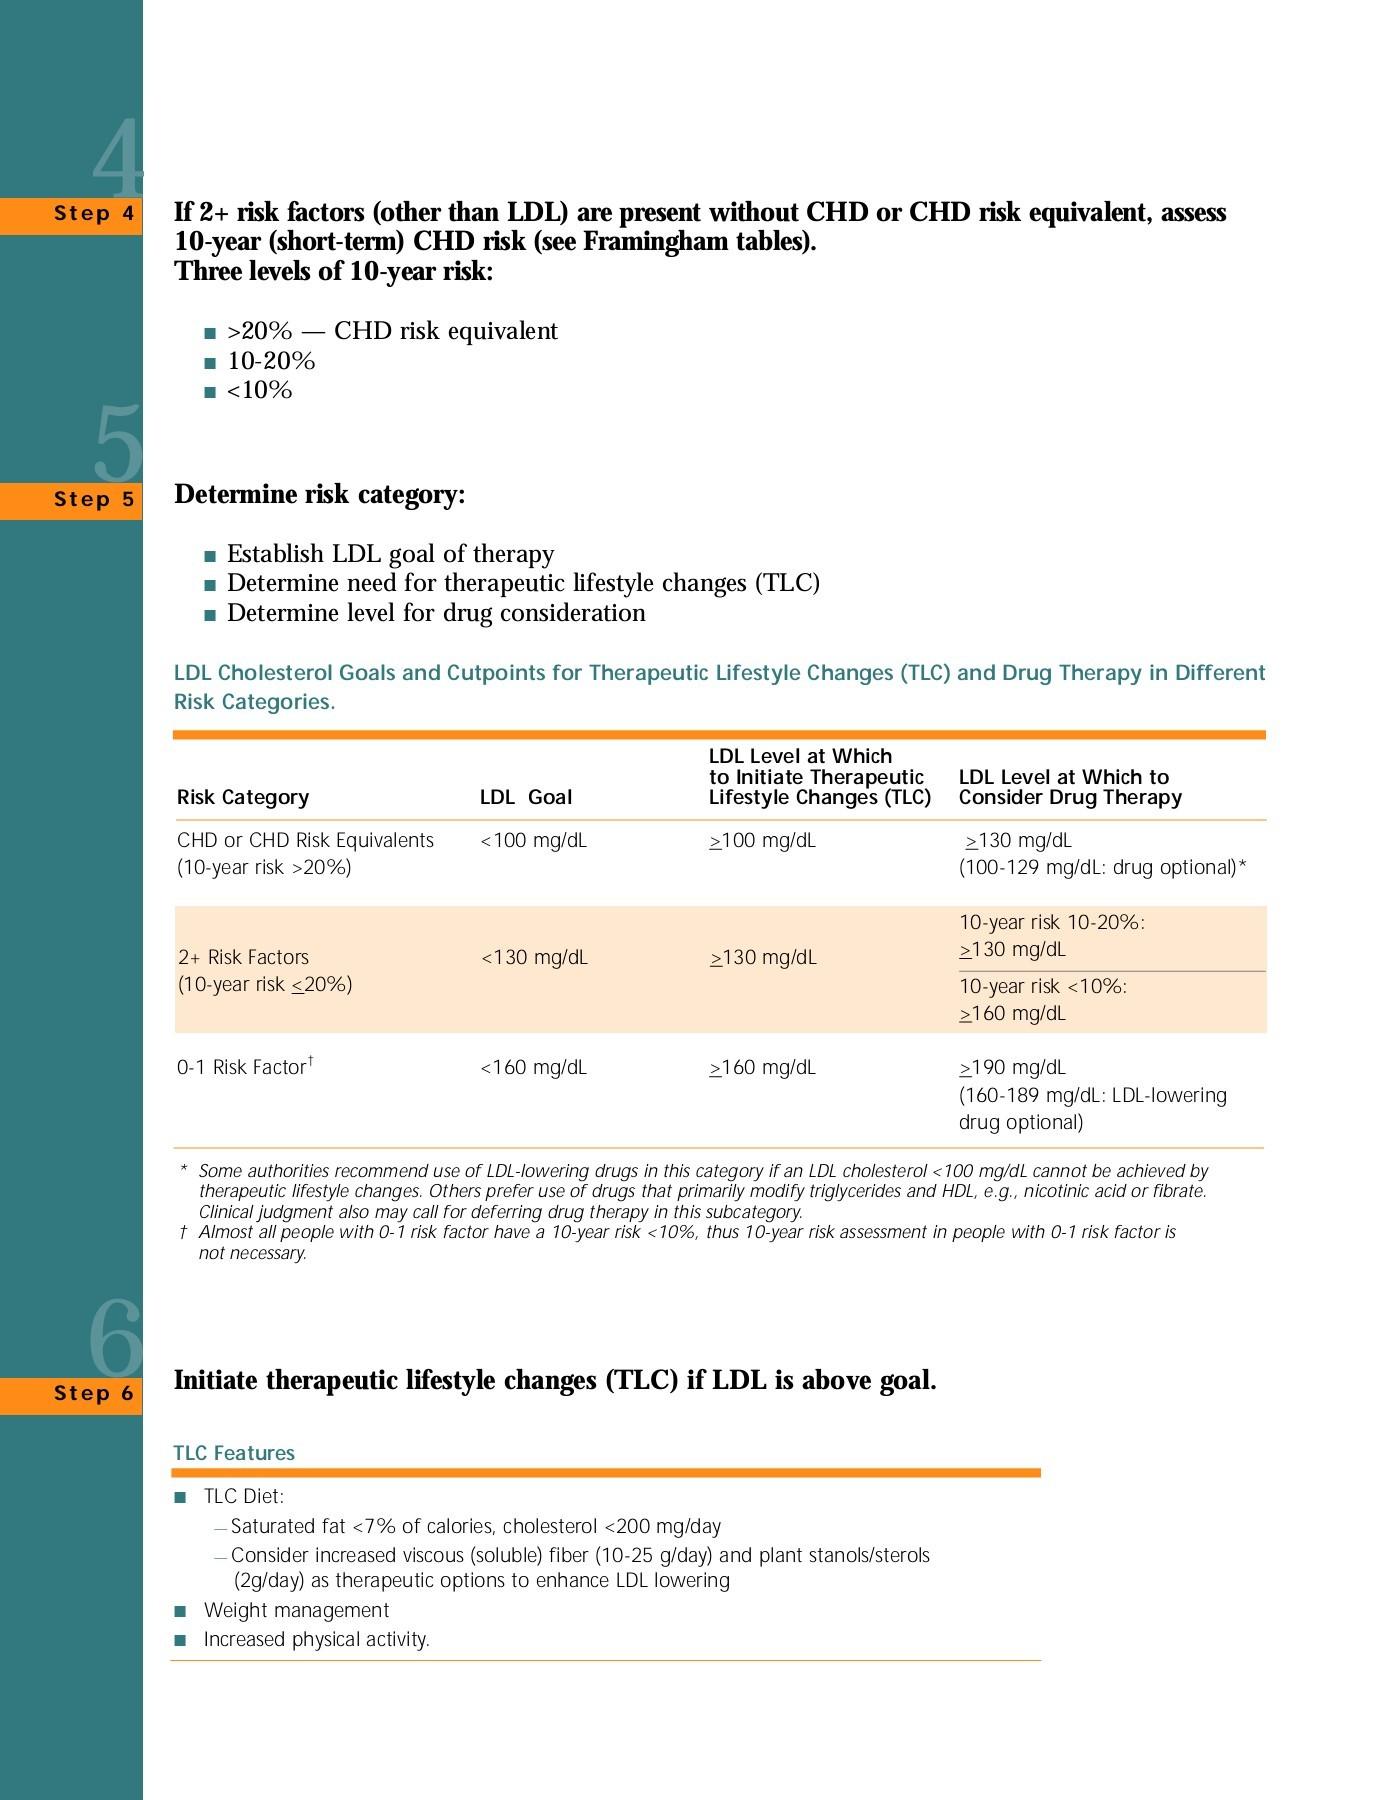 atp iii guidelines at a glance quick desk reference fliphtml5 rh fliphtml5 com ATP IV ATP III Framingham Risk Assessment